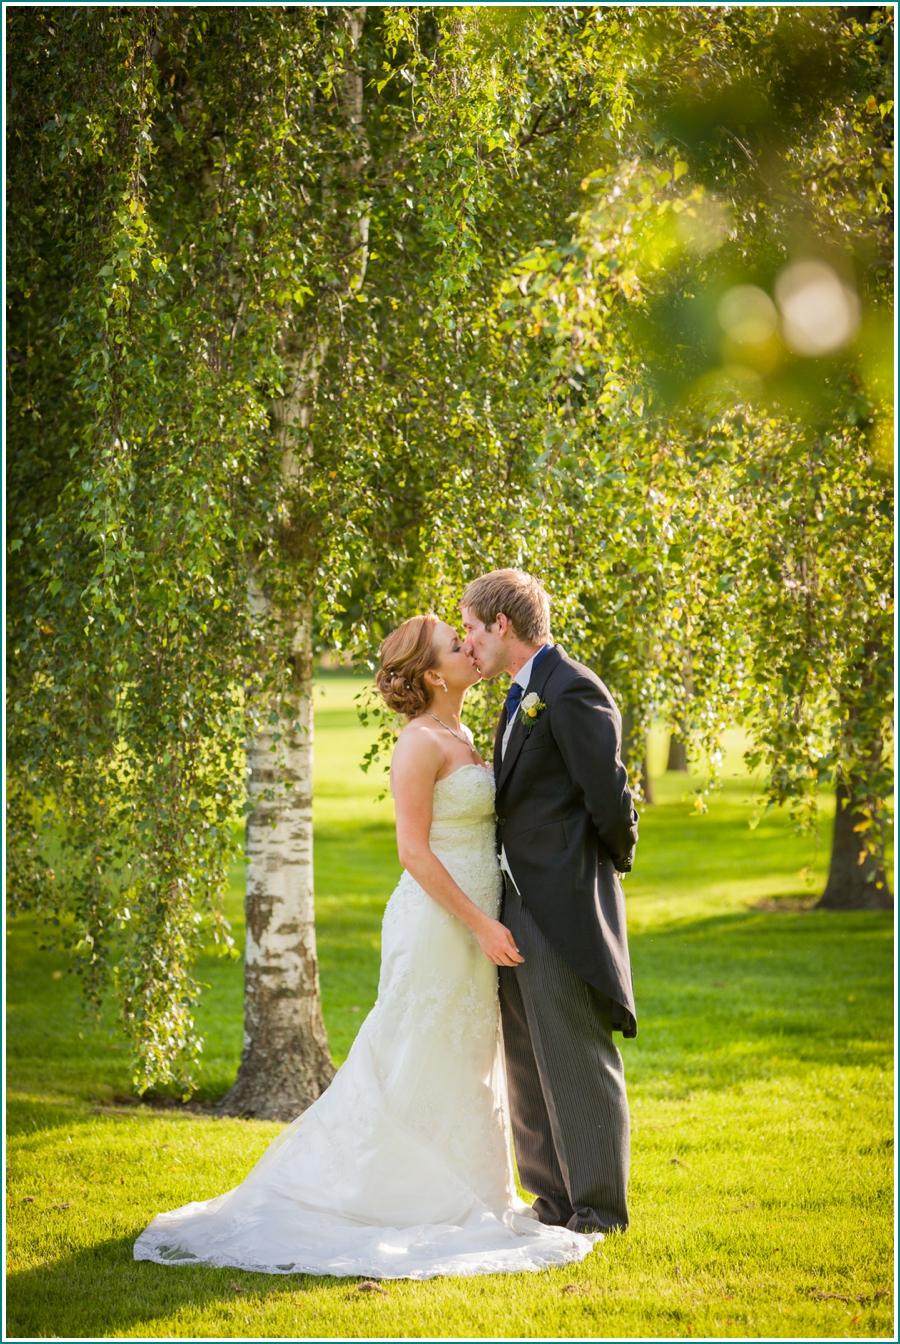 Mendip-Springs-wedding-photographer047.jpg